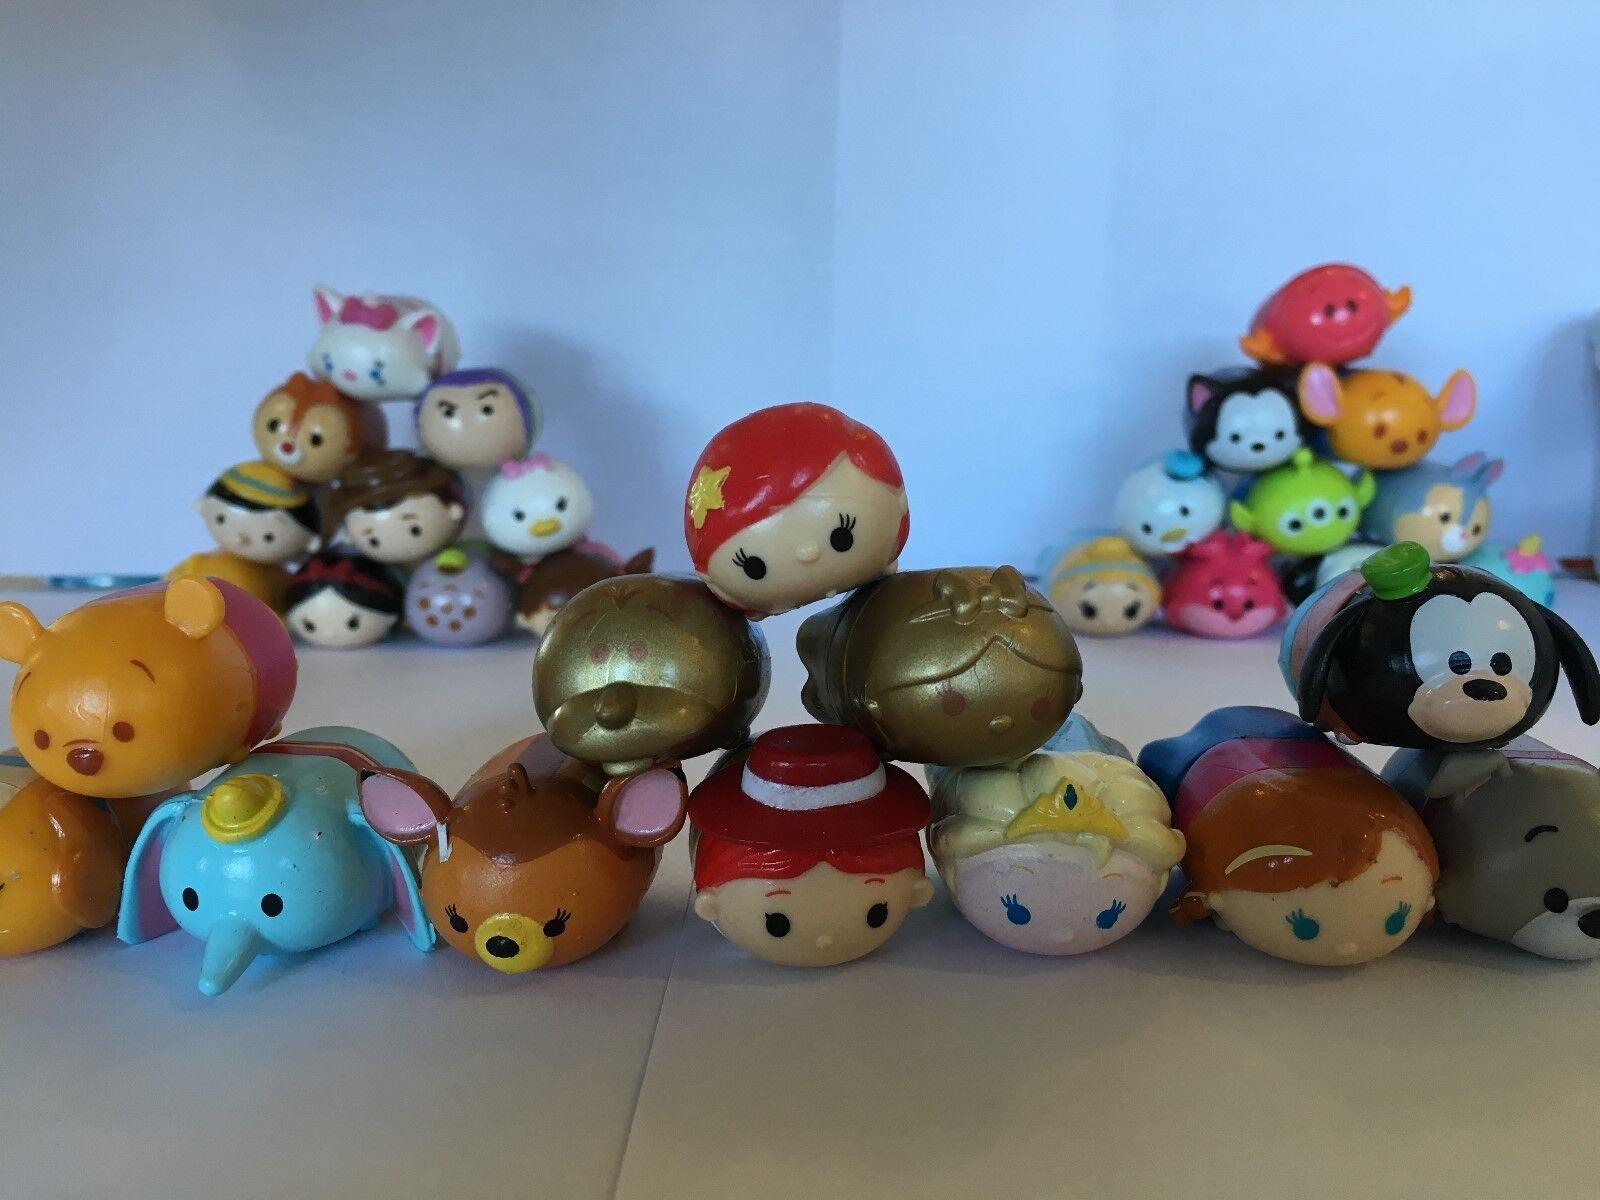 Disney Tsum Tsum Series 1 Squishy Vinyl Figures/Squishies/Characters -Brand New